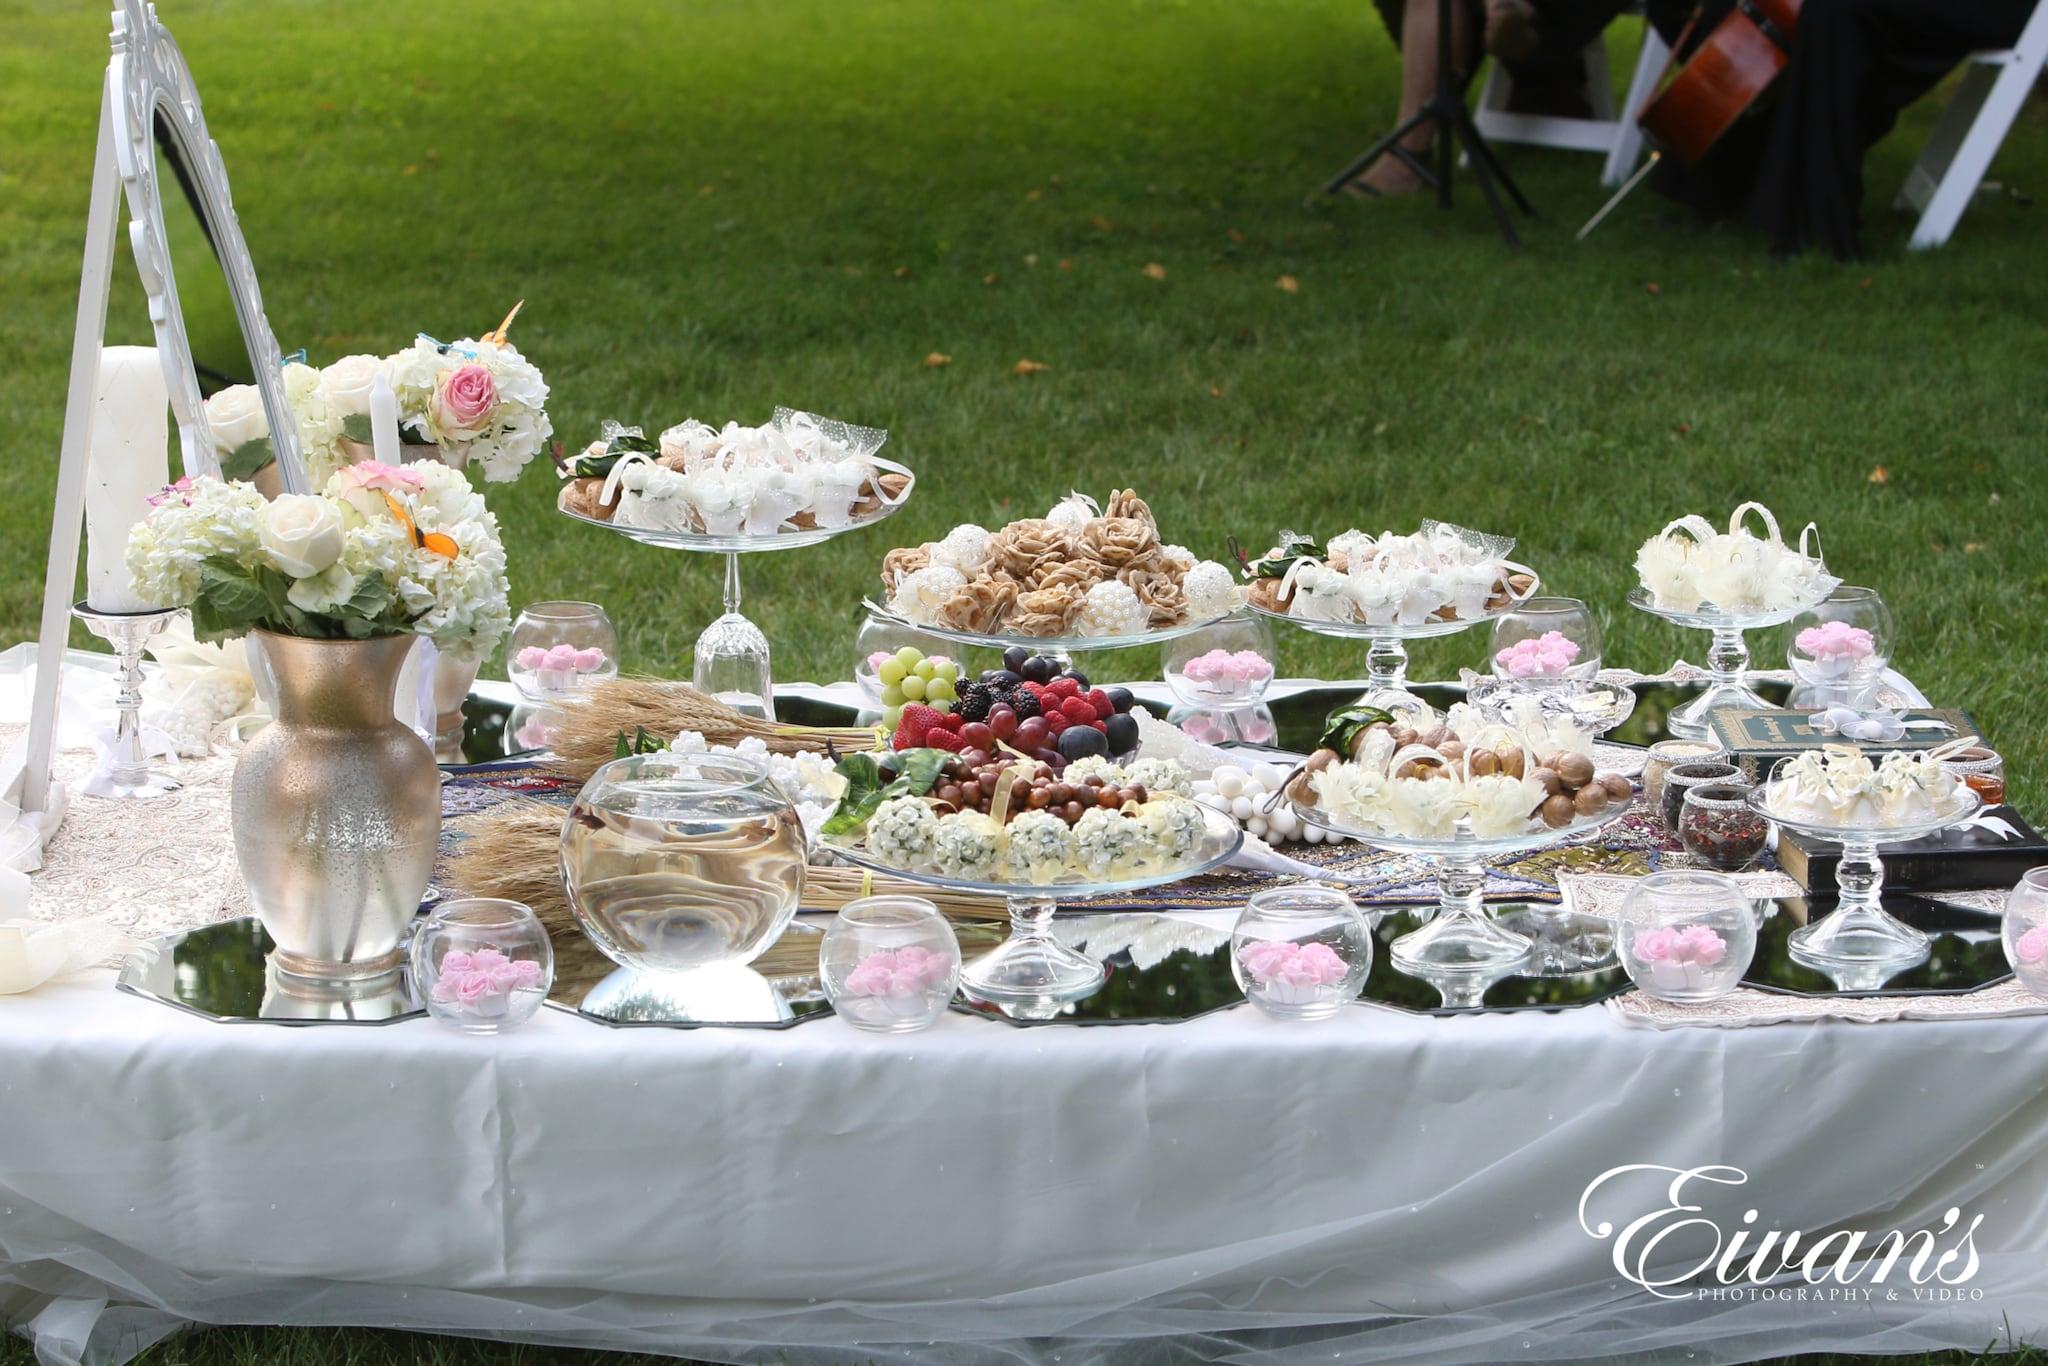 image of a wedding dessert table